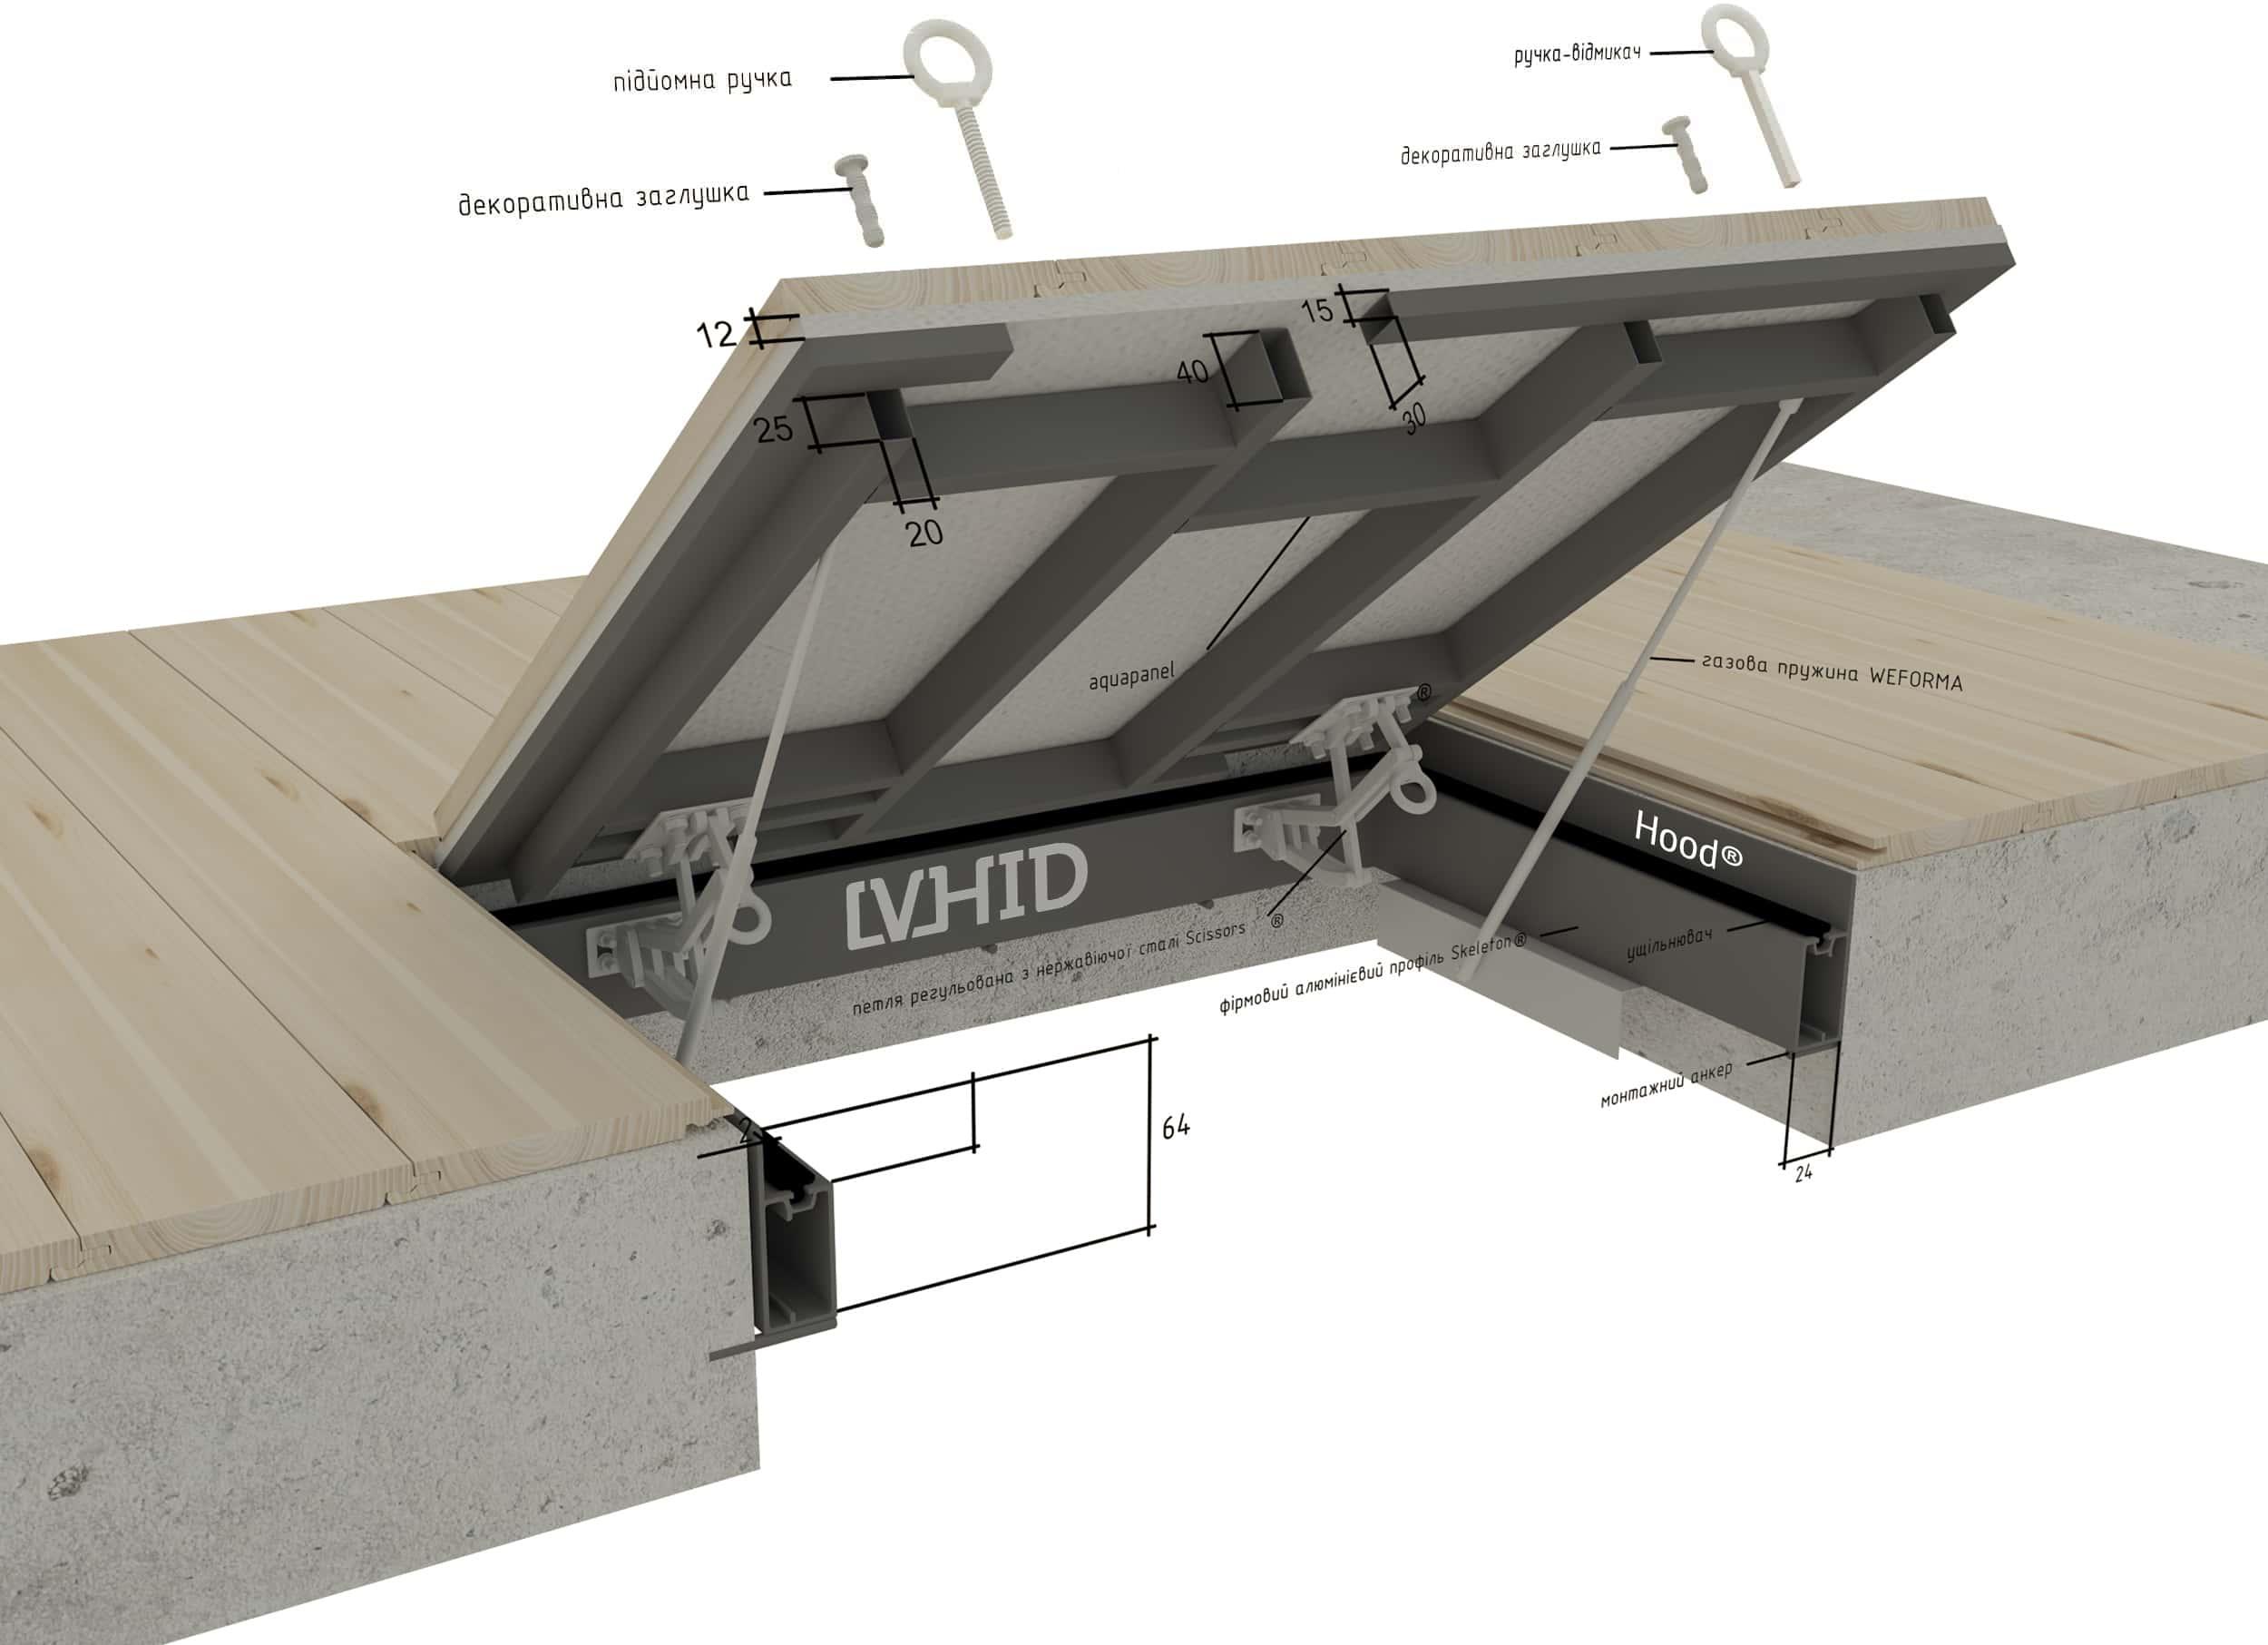 Hood-vhid-3D-drawing